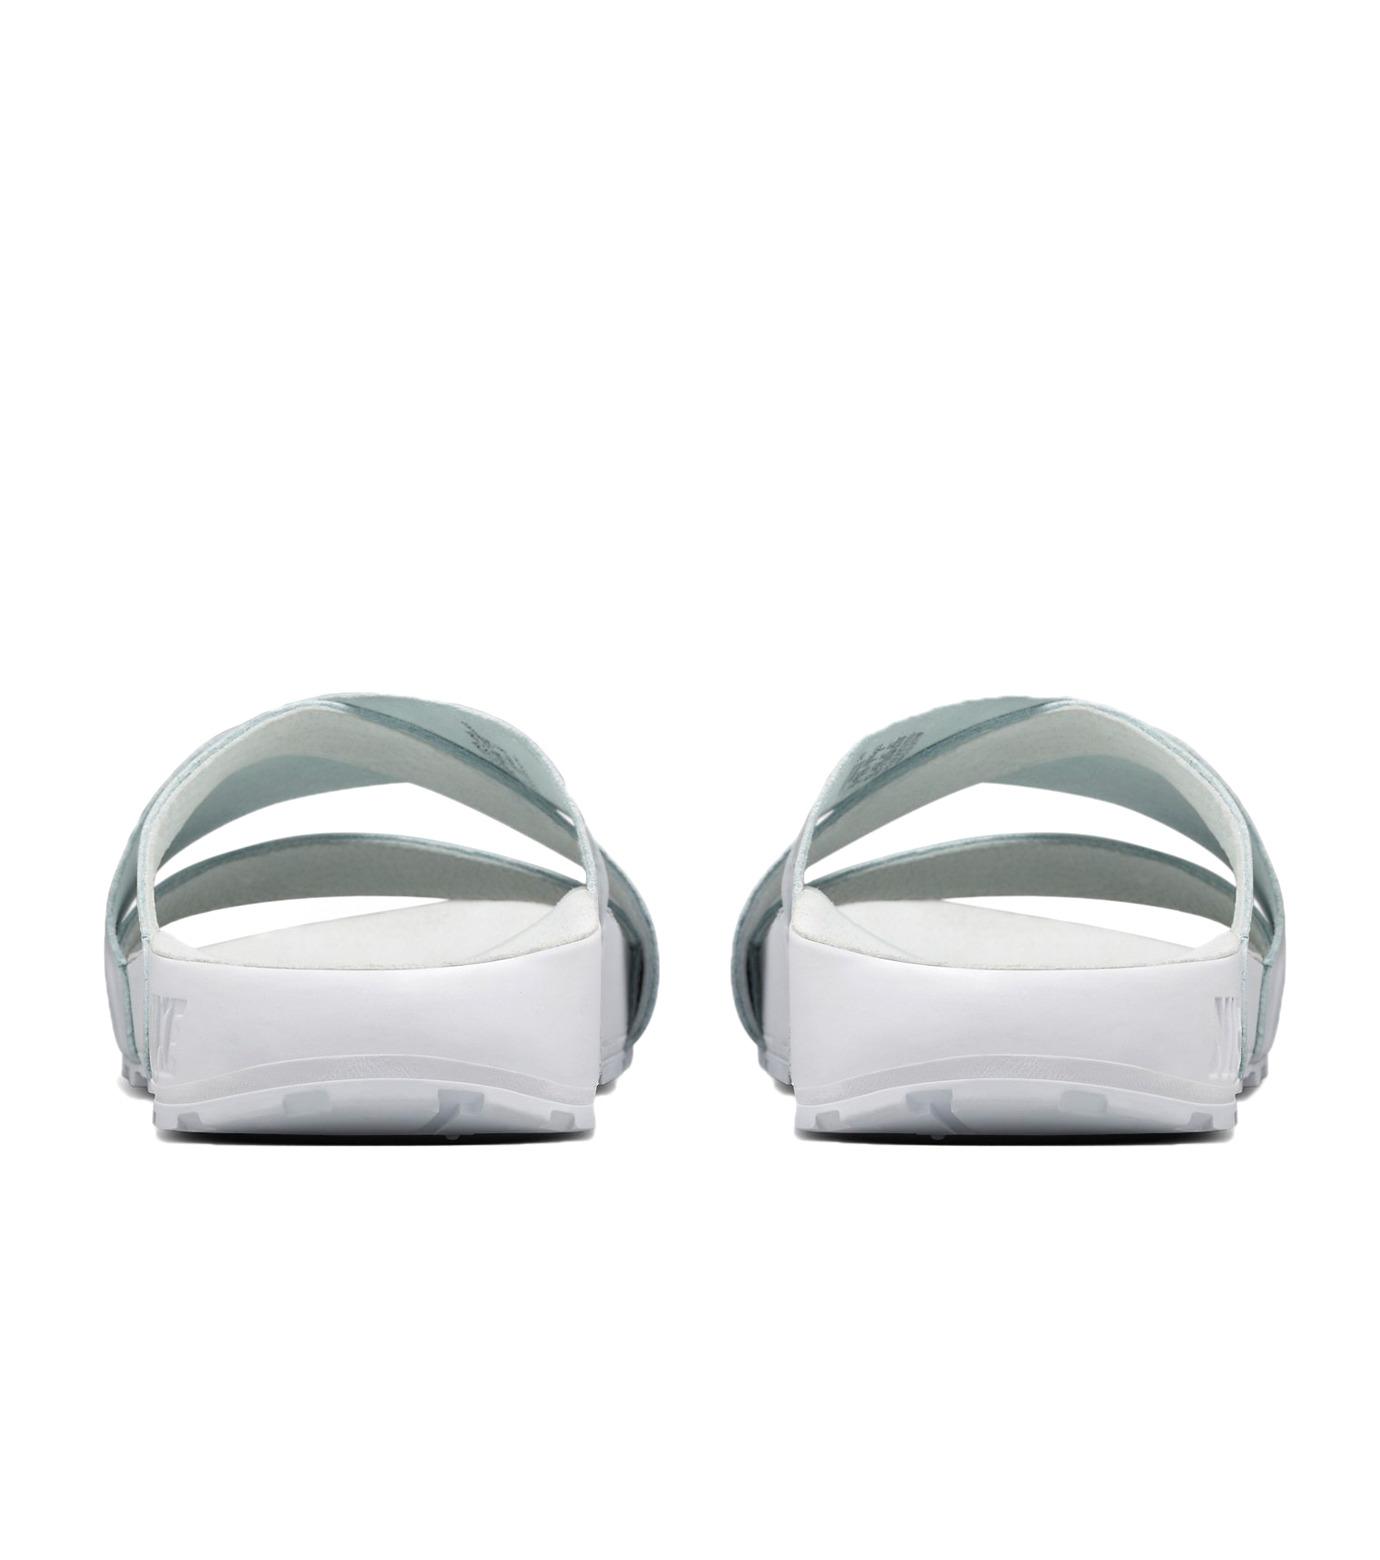 NIKE(ナイキ)のTaupo-WHITE(シューズ/shoes)-849756-100-4 拡大詳細画像5